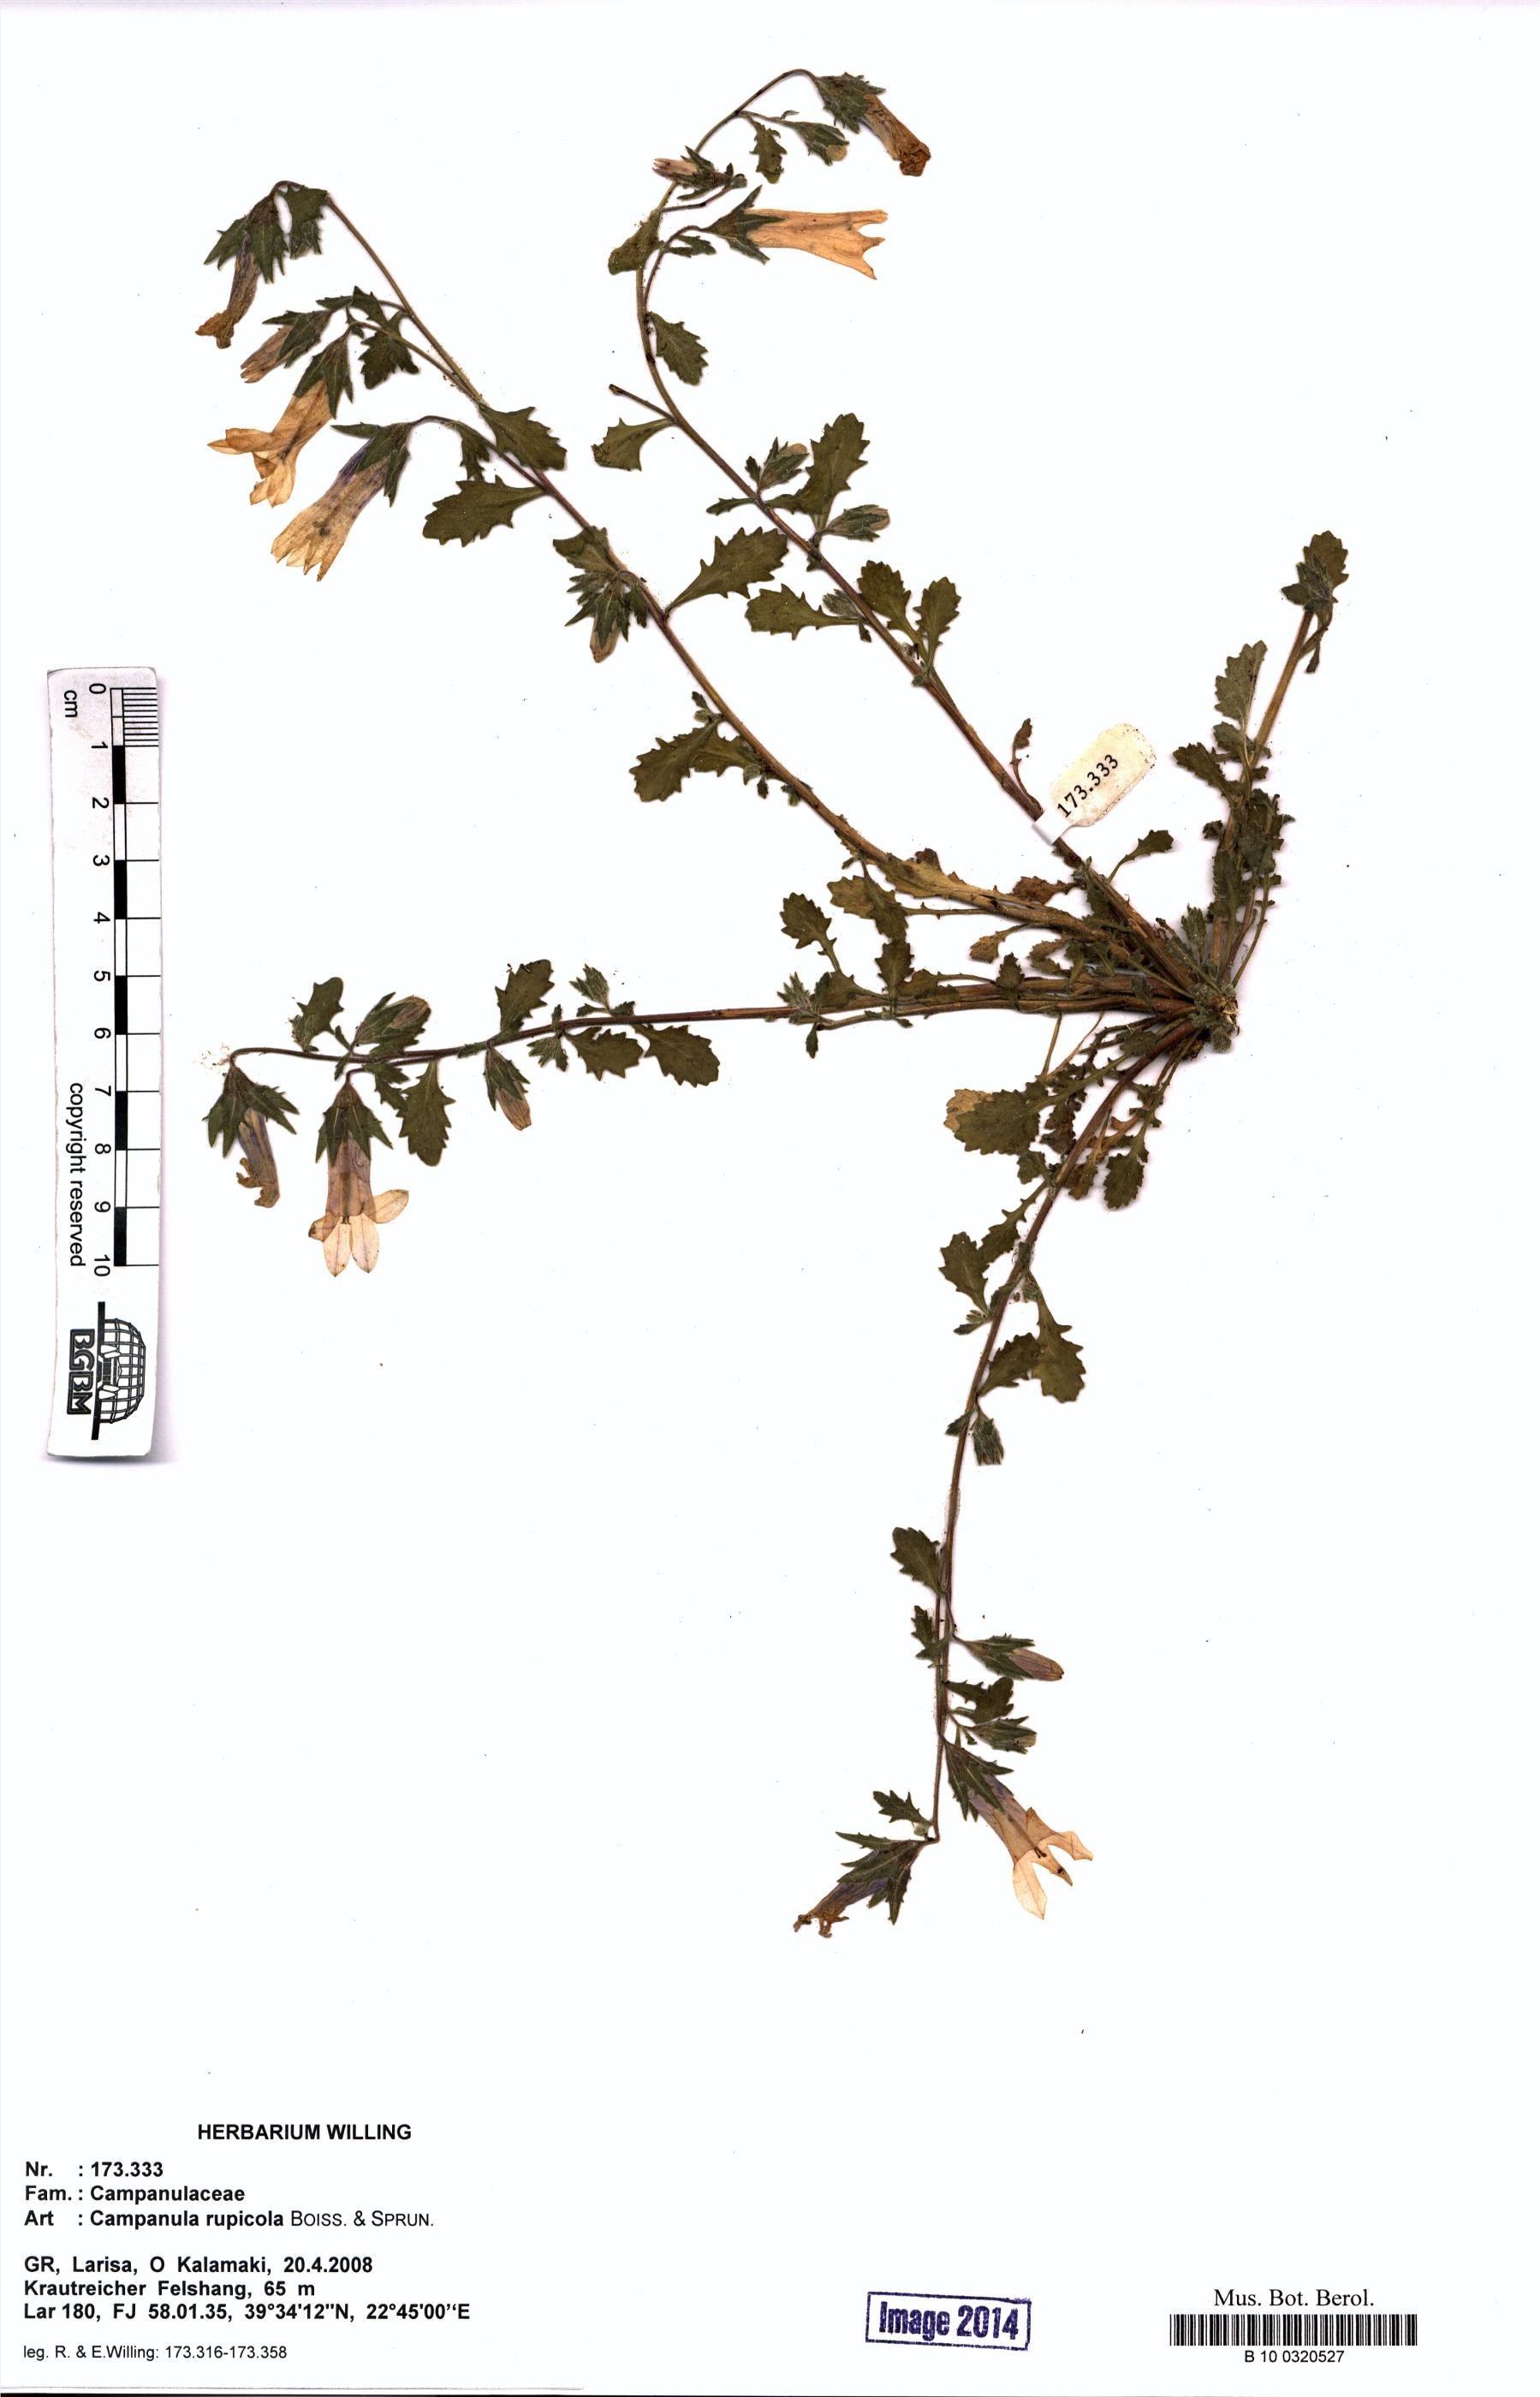 http://ww2.bgbm.org/herbarium/images/B/10/03/20/52/B_10_0320527.jpg